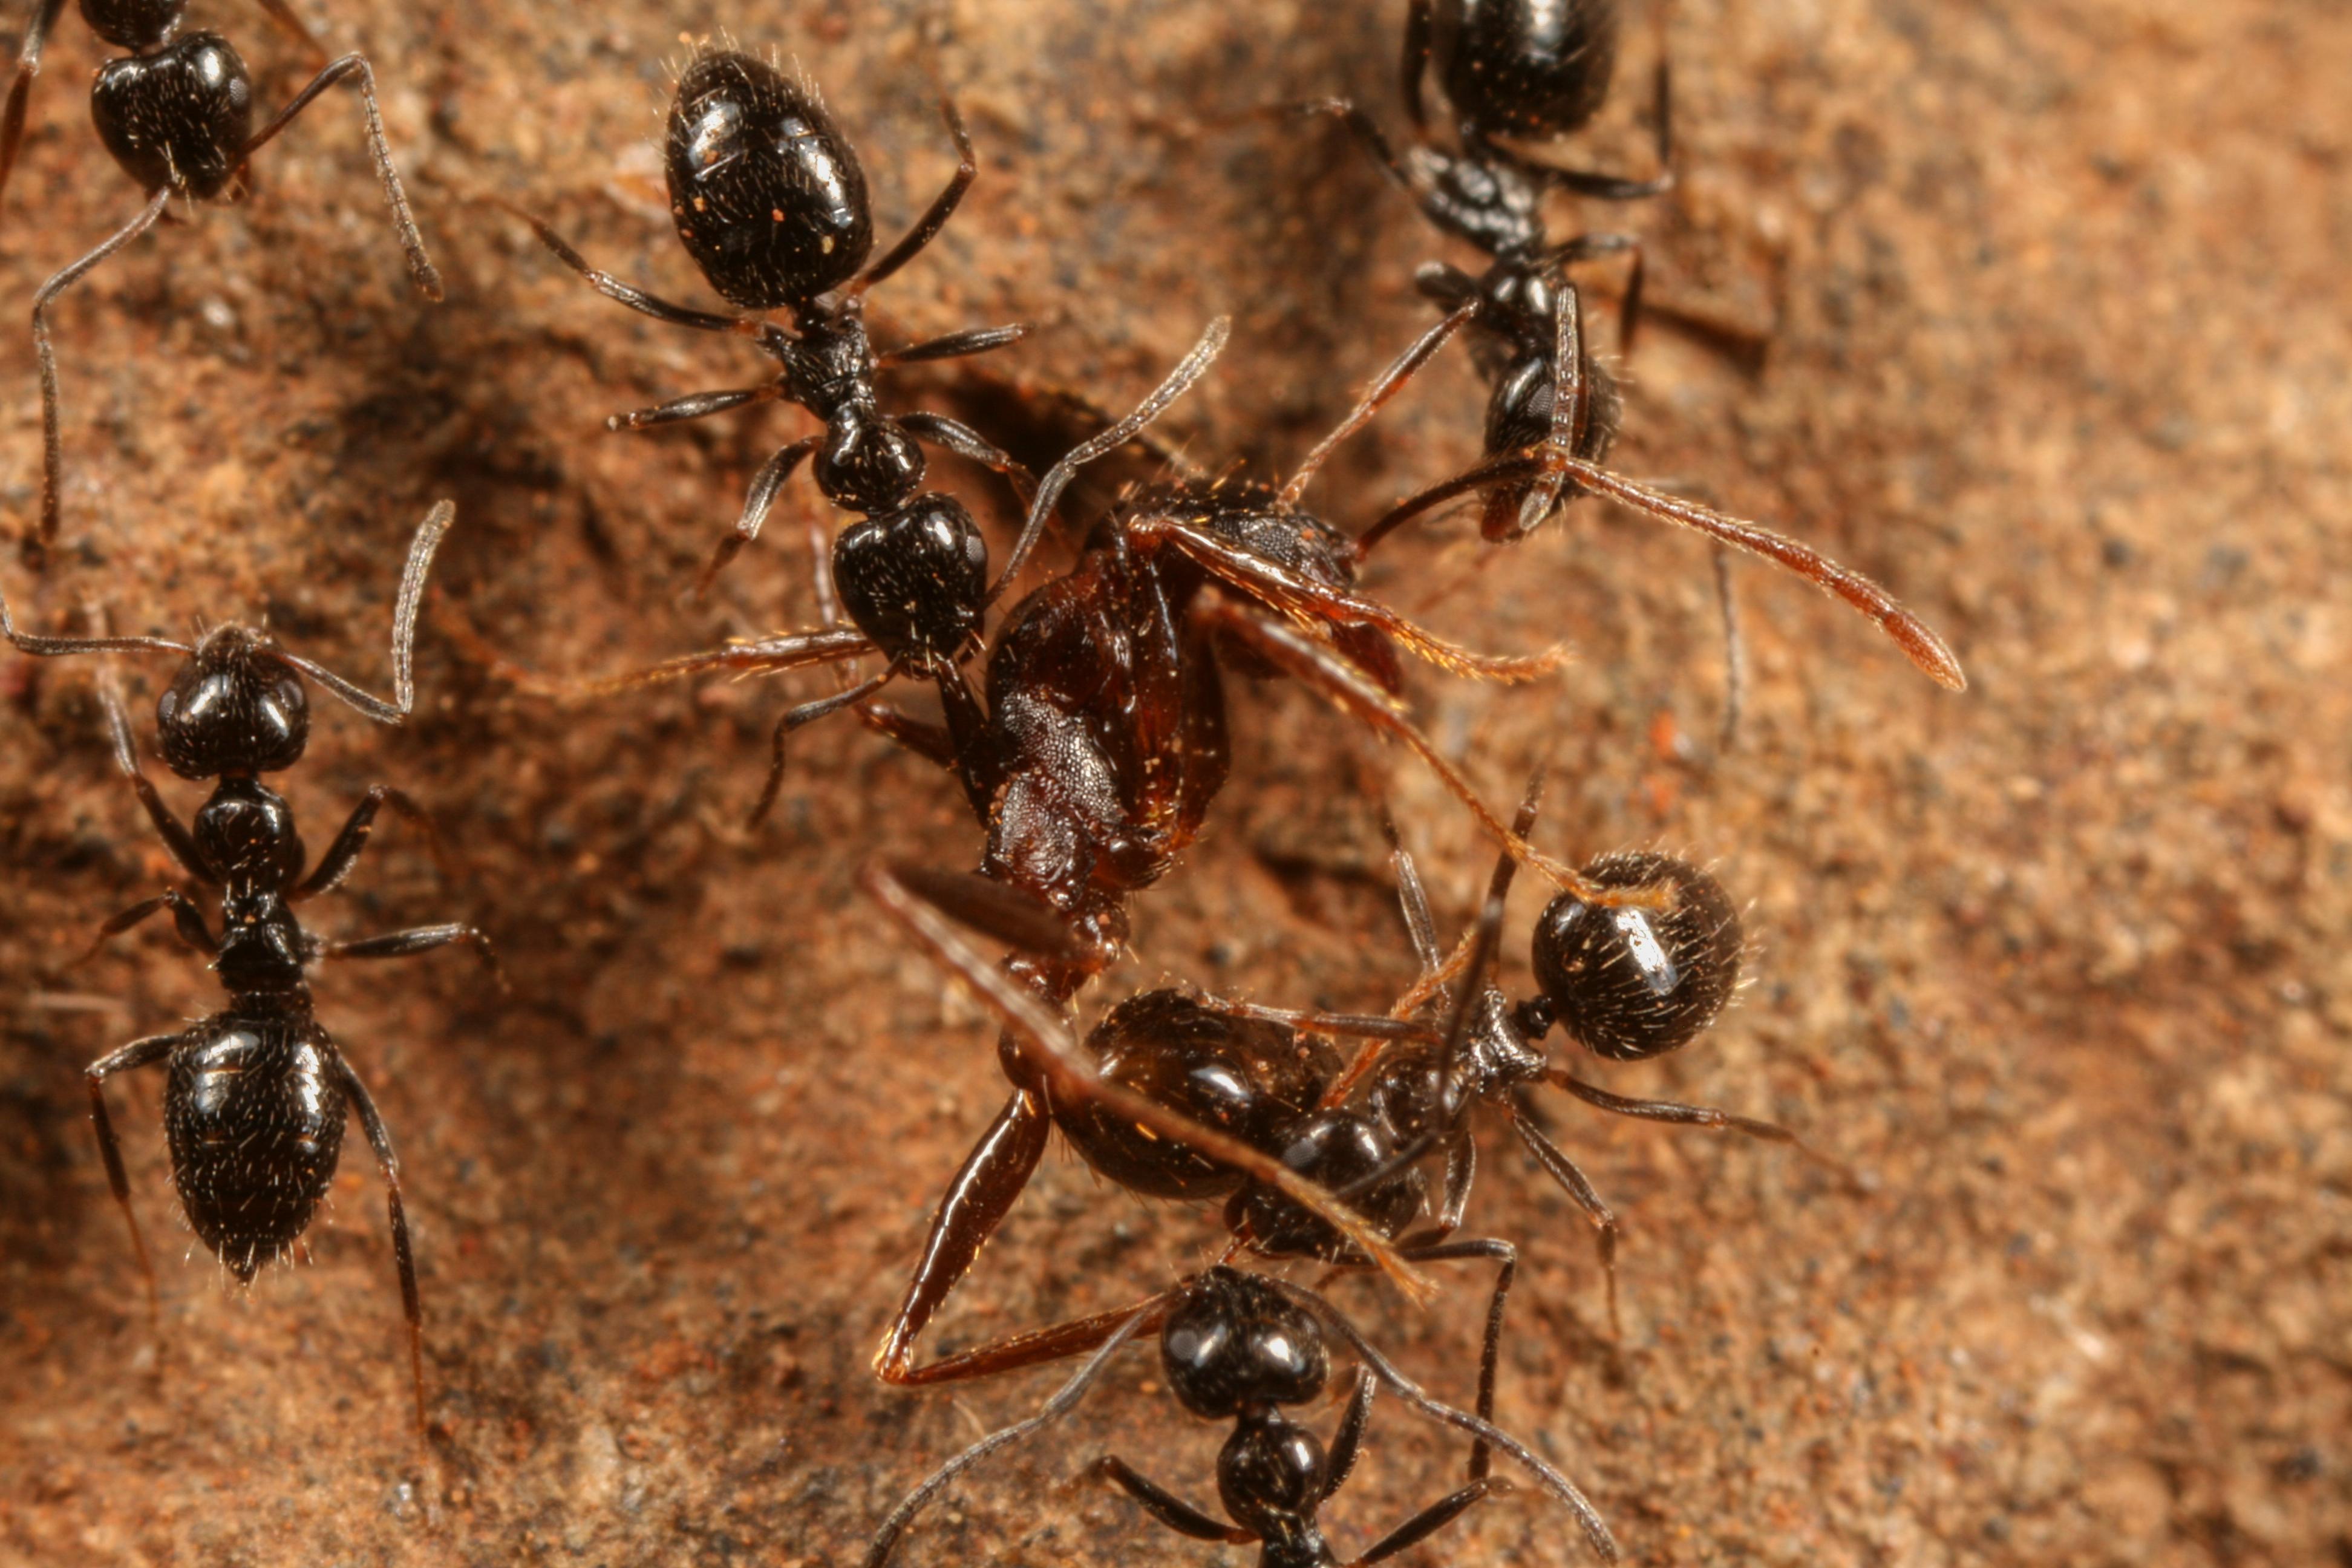 Lepisiota dispatching Pheidole ant